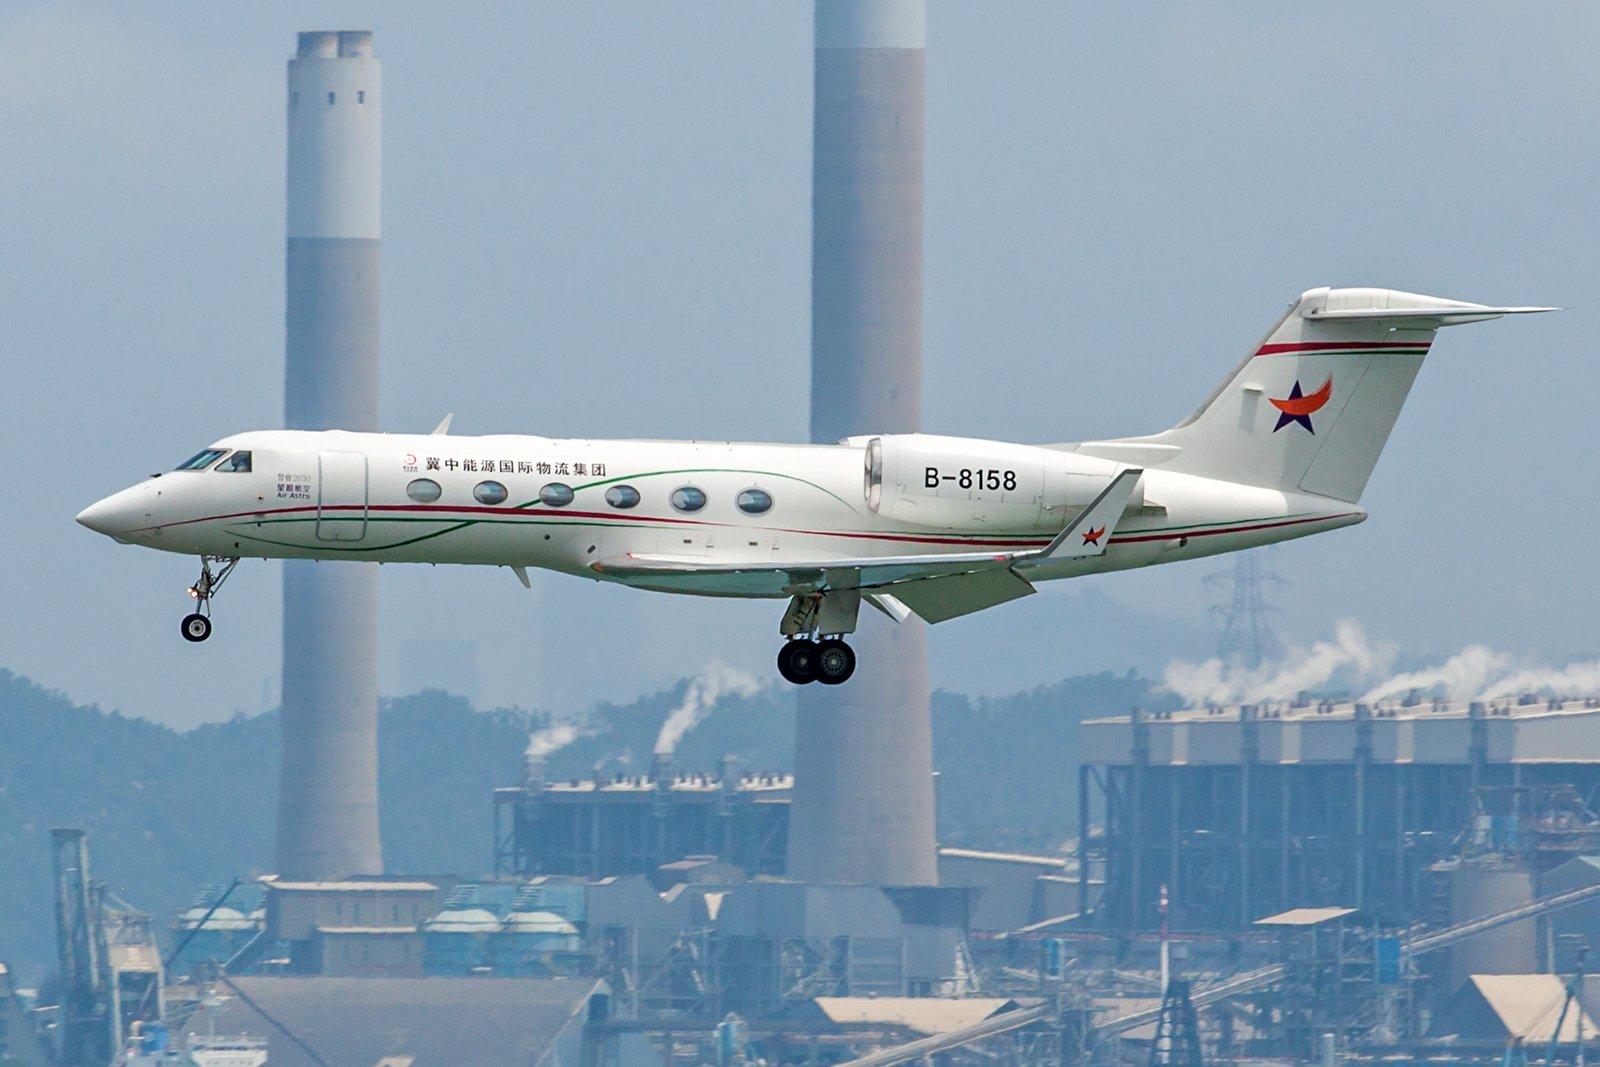 Hebei Aviation Group (Beijing Airlines) Gulfstream G450 B-8158